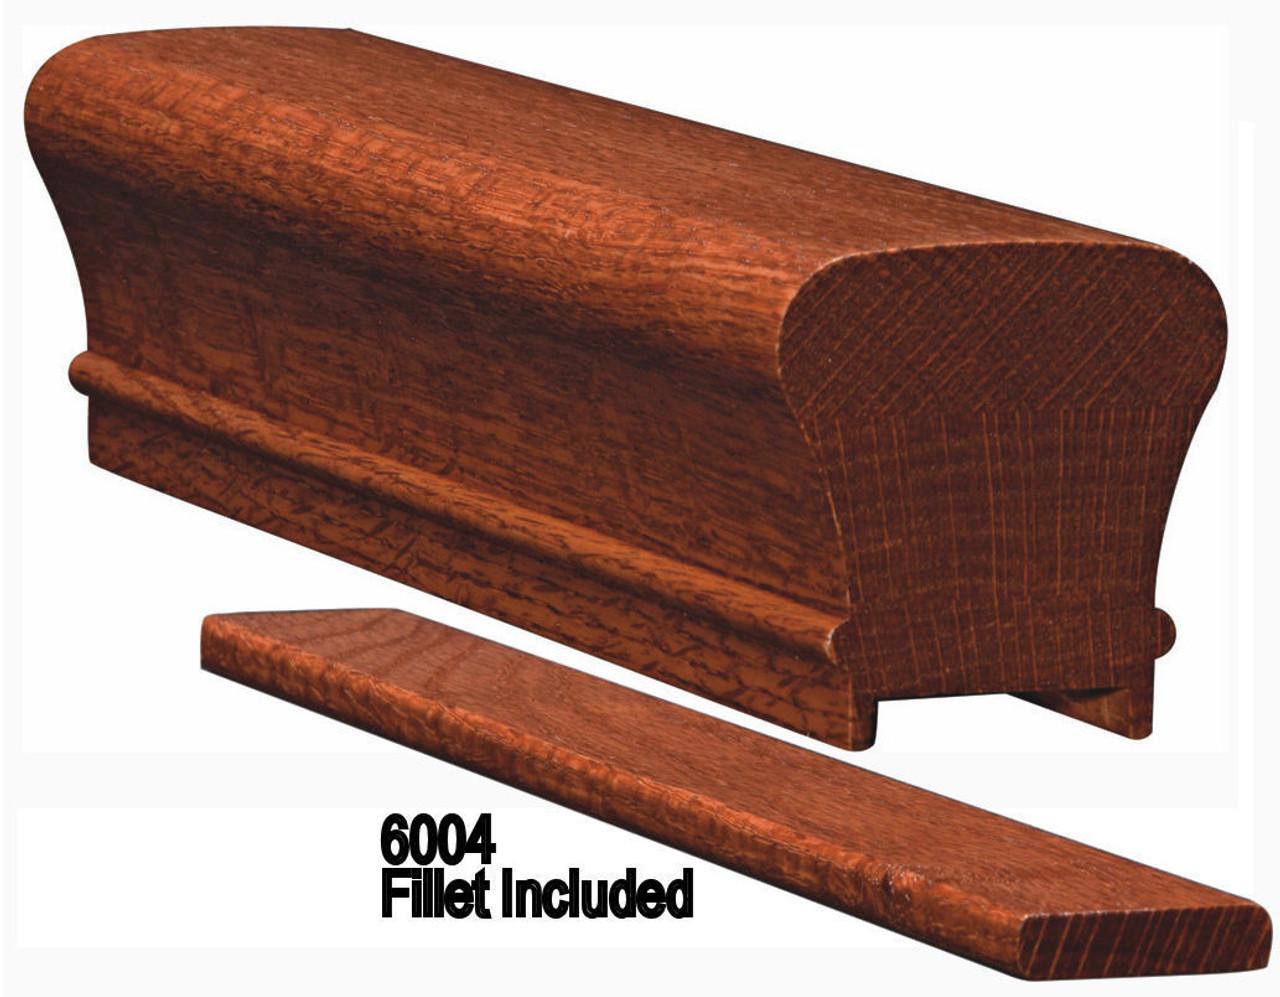 6010P Walnut Colonial Handrail